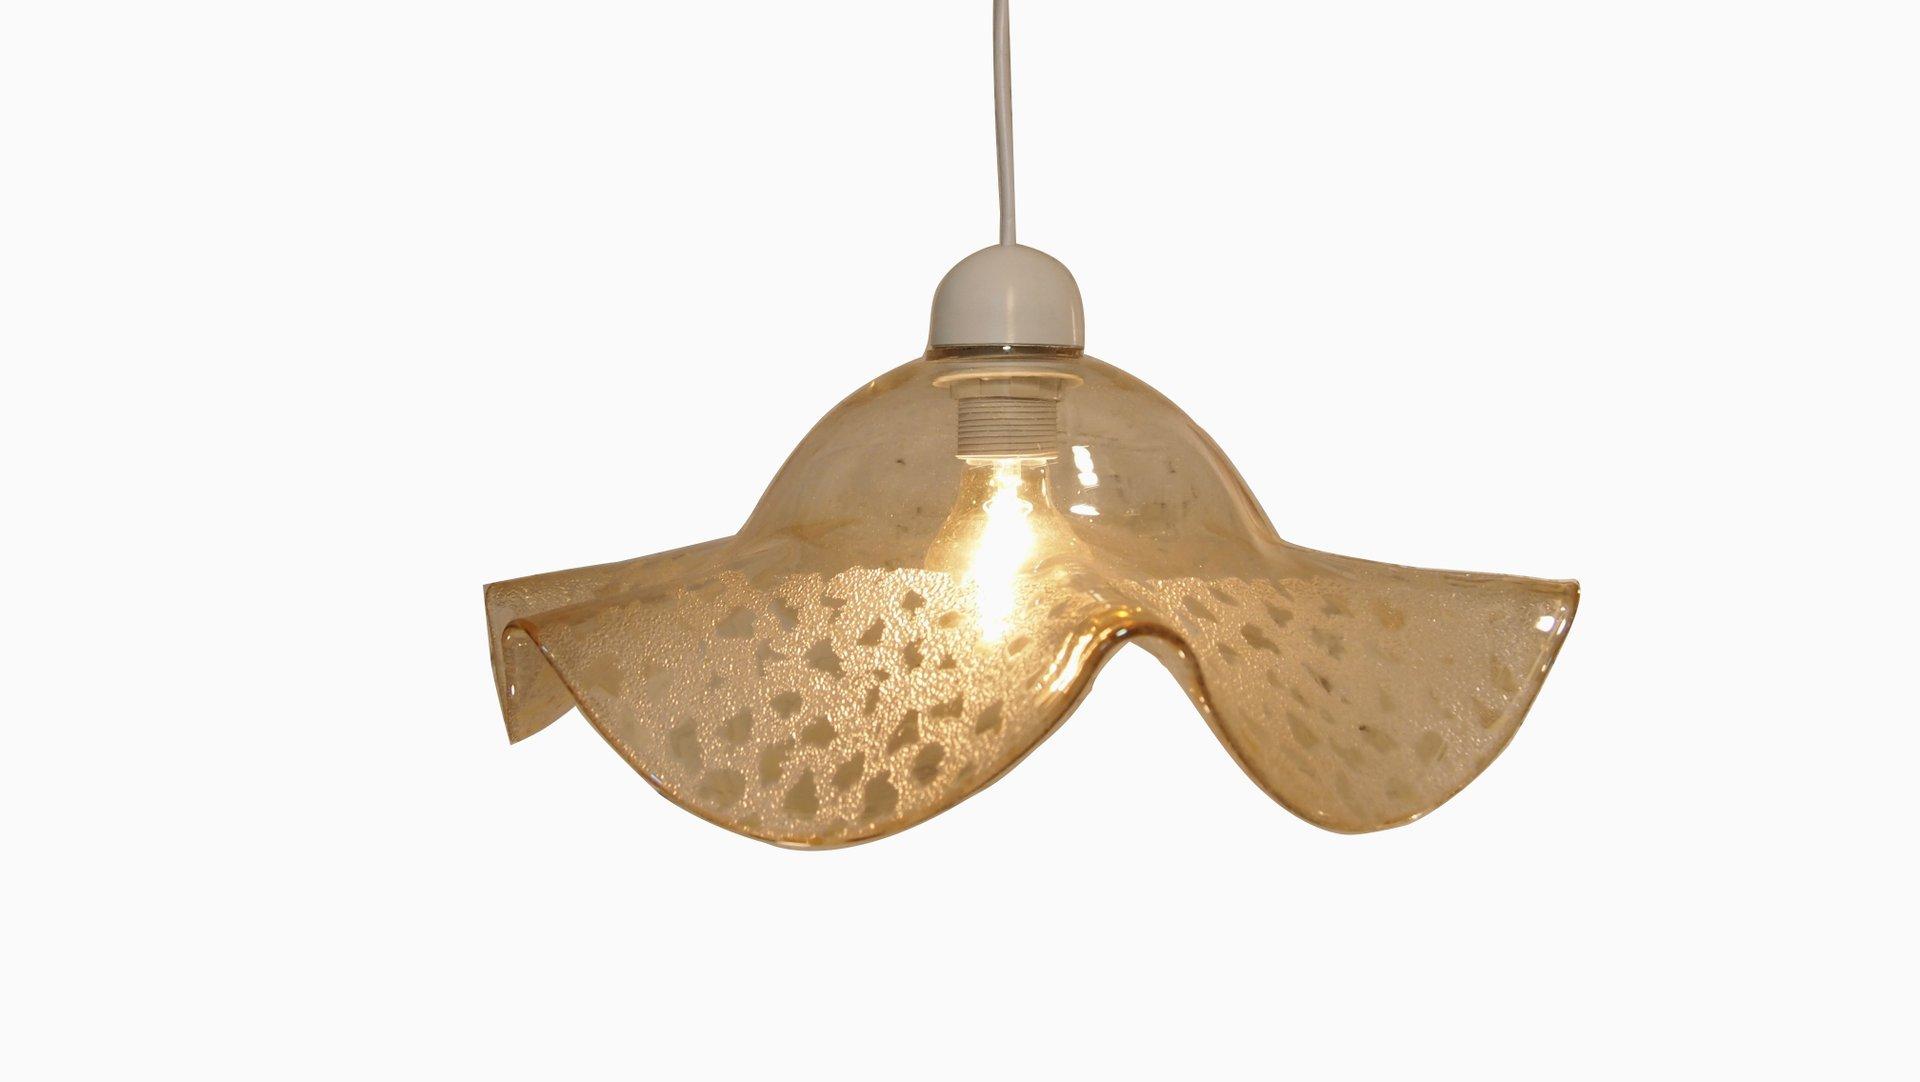 Mid century smoked murano glass pendant hanging light from venini mid century smoked murano glass pendant hanging light from venini 1960s aloadofball Image collections